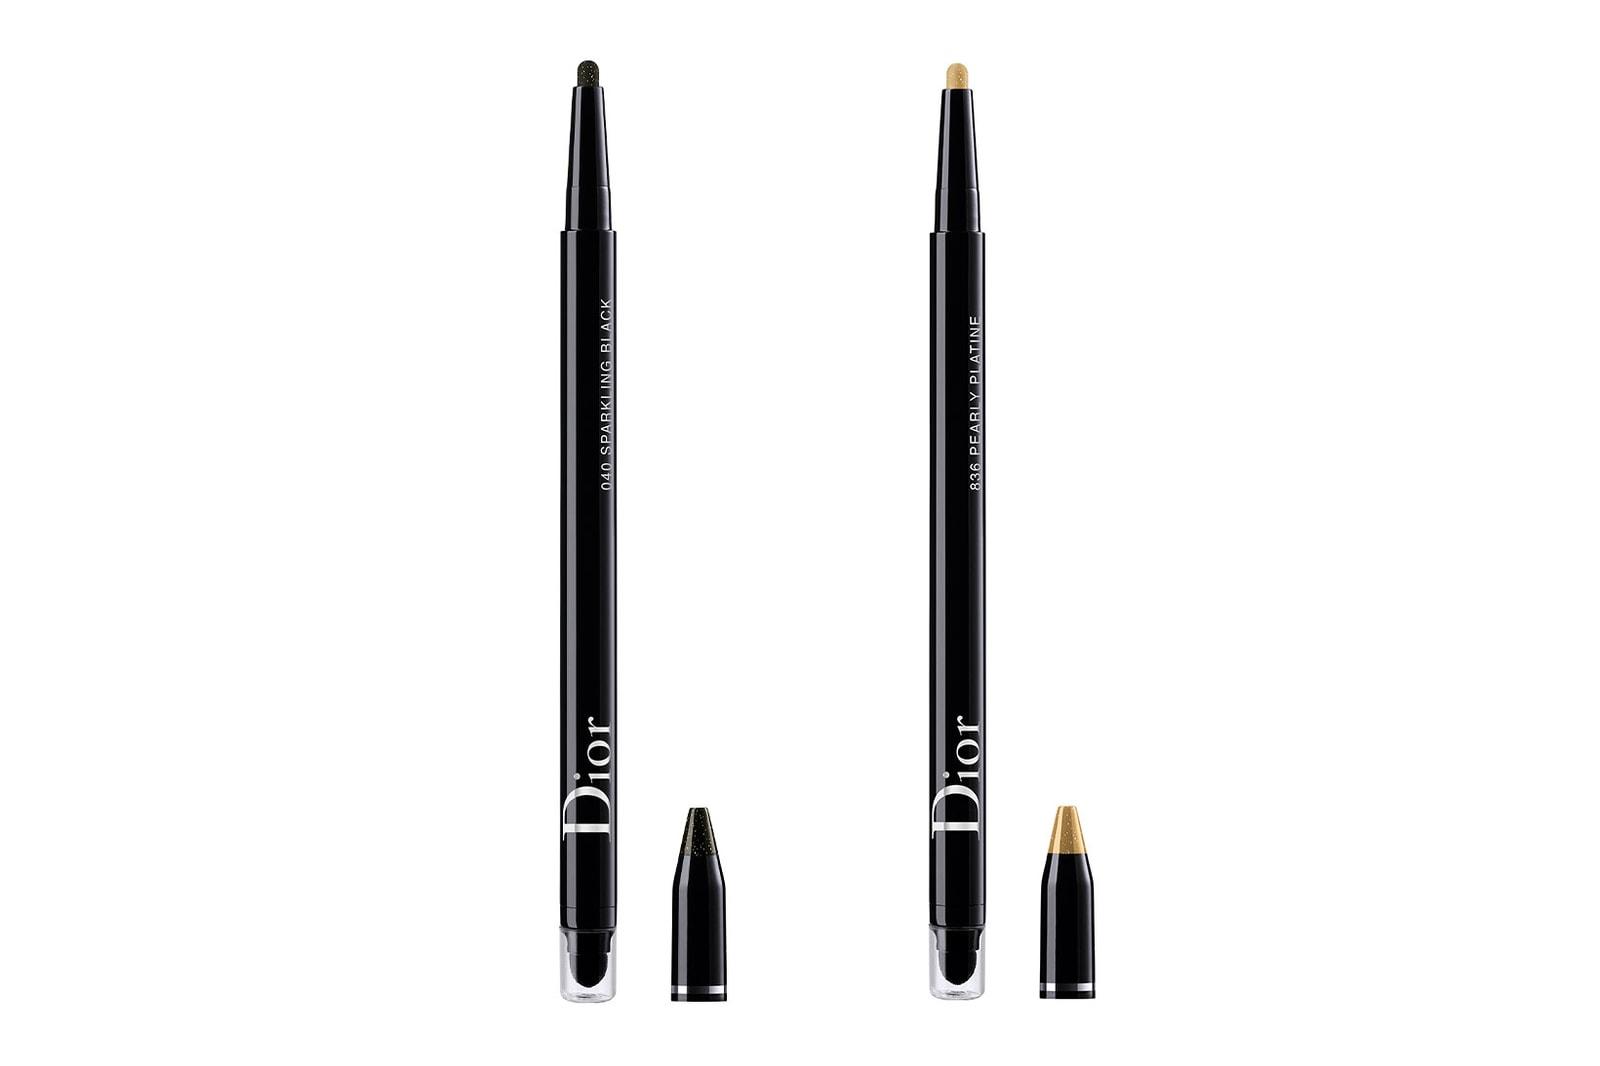 dior makeup holiday collection golden nights forever cushion powder eyeshadow palettes diorific lipsticks price